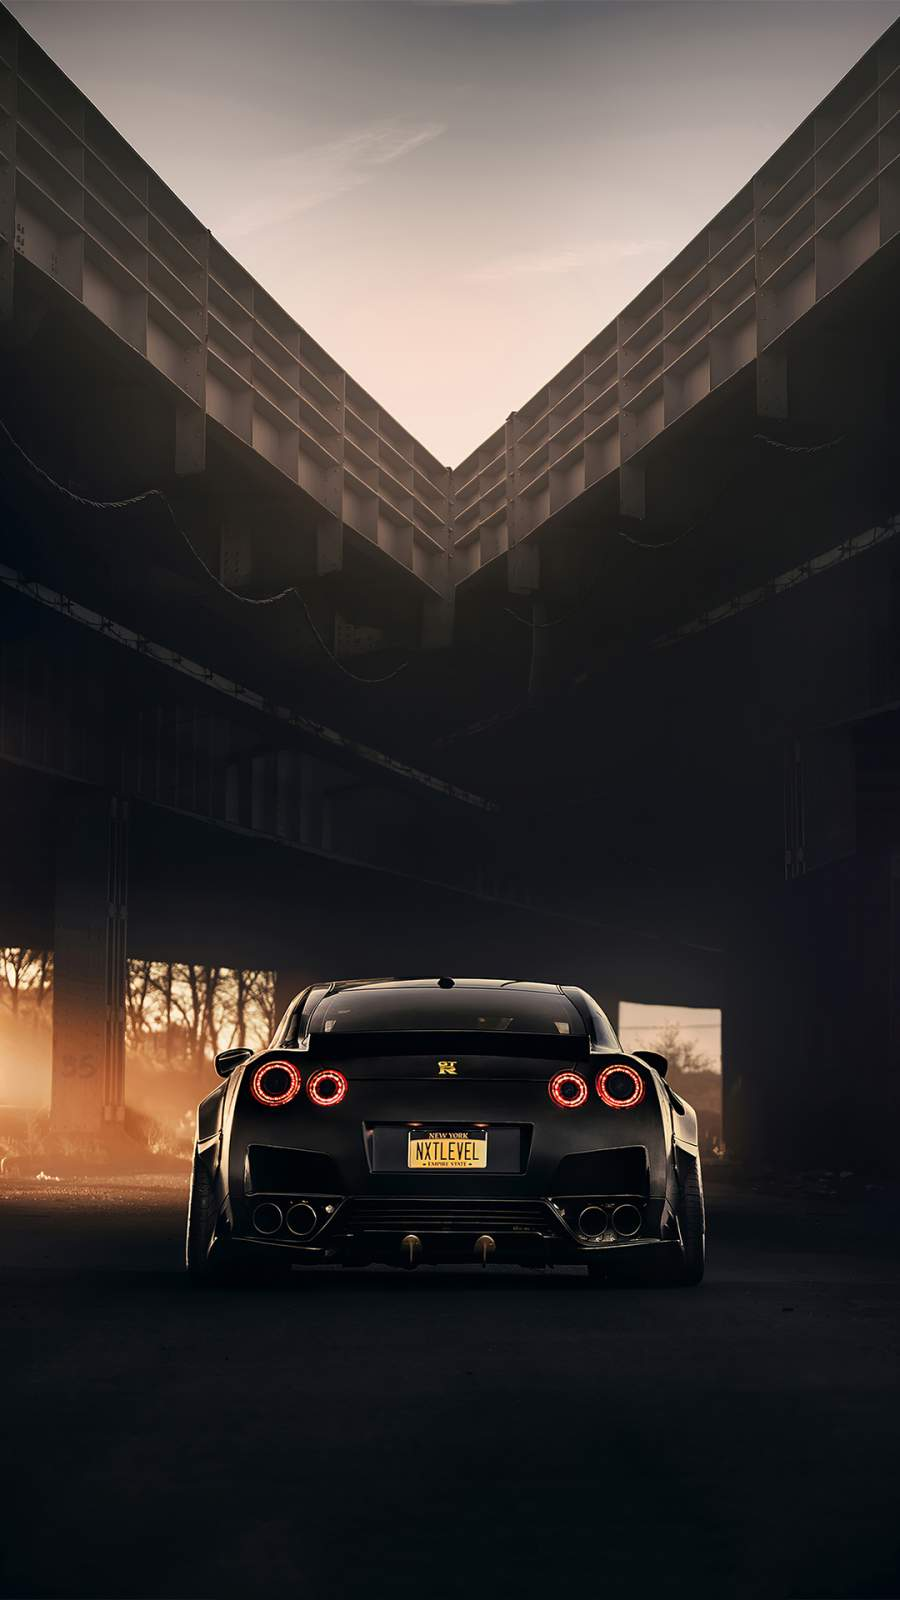 Nissan GTR Black iPhone Wallpaper